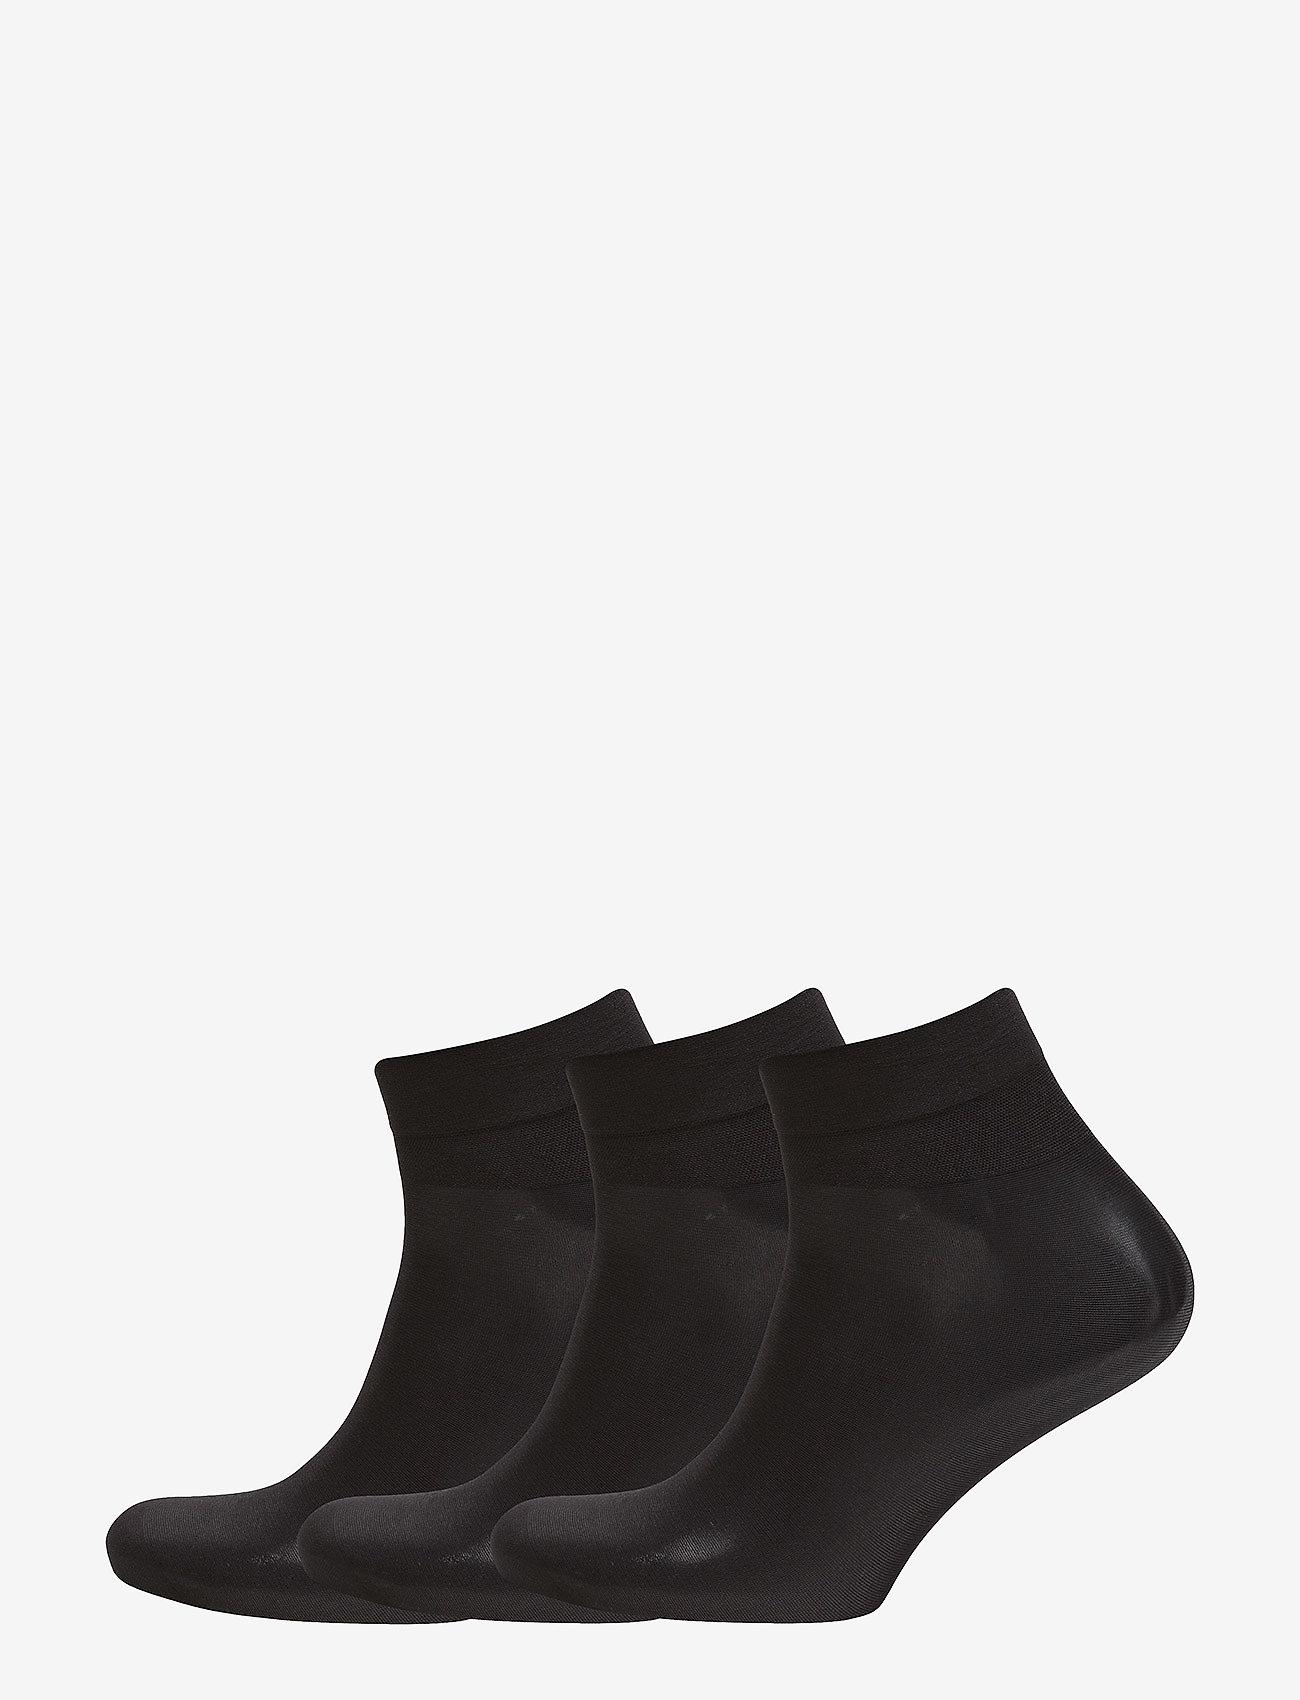 Hudson - SIMPLY 20 3-PACK - tavalliset sukat - black - 0